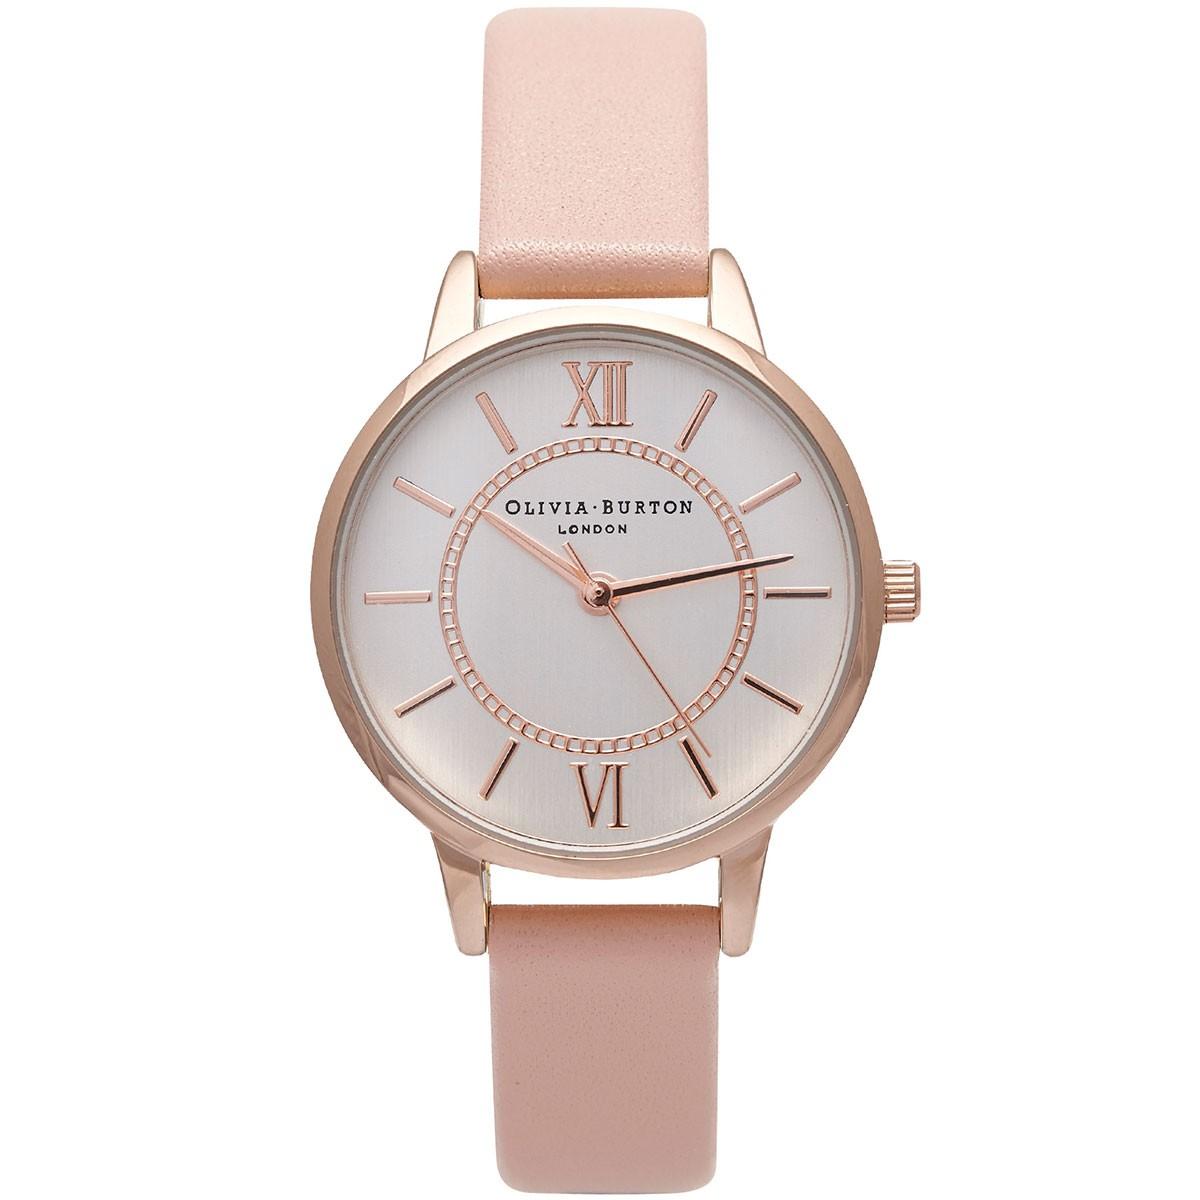 Đồng hồ kim nữ Olivia Burton OB15WD28 phối dây da hồng